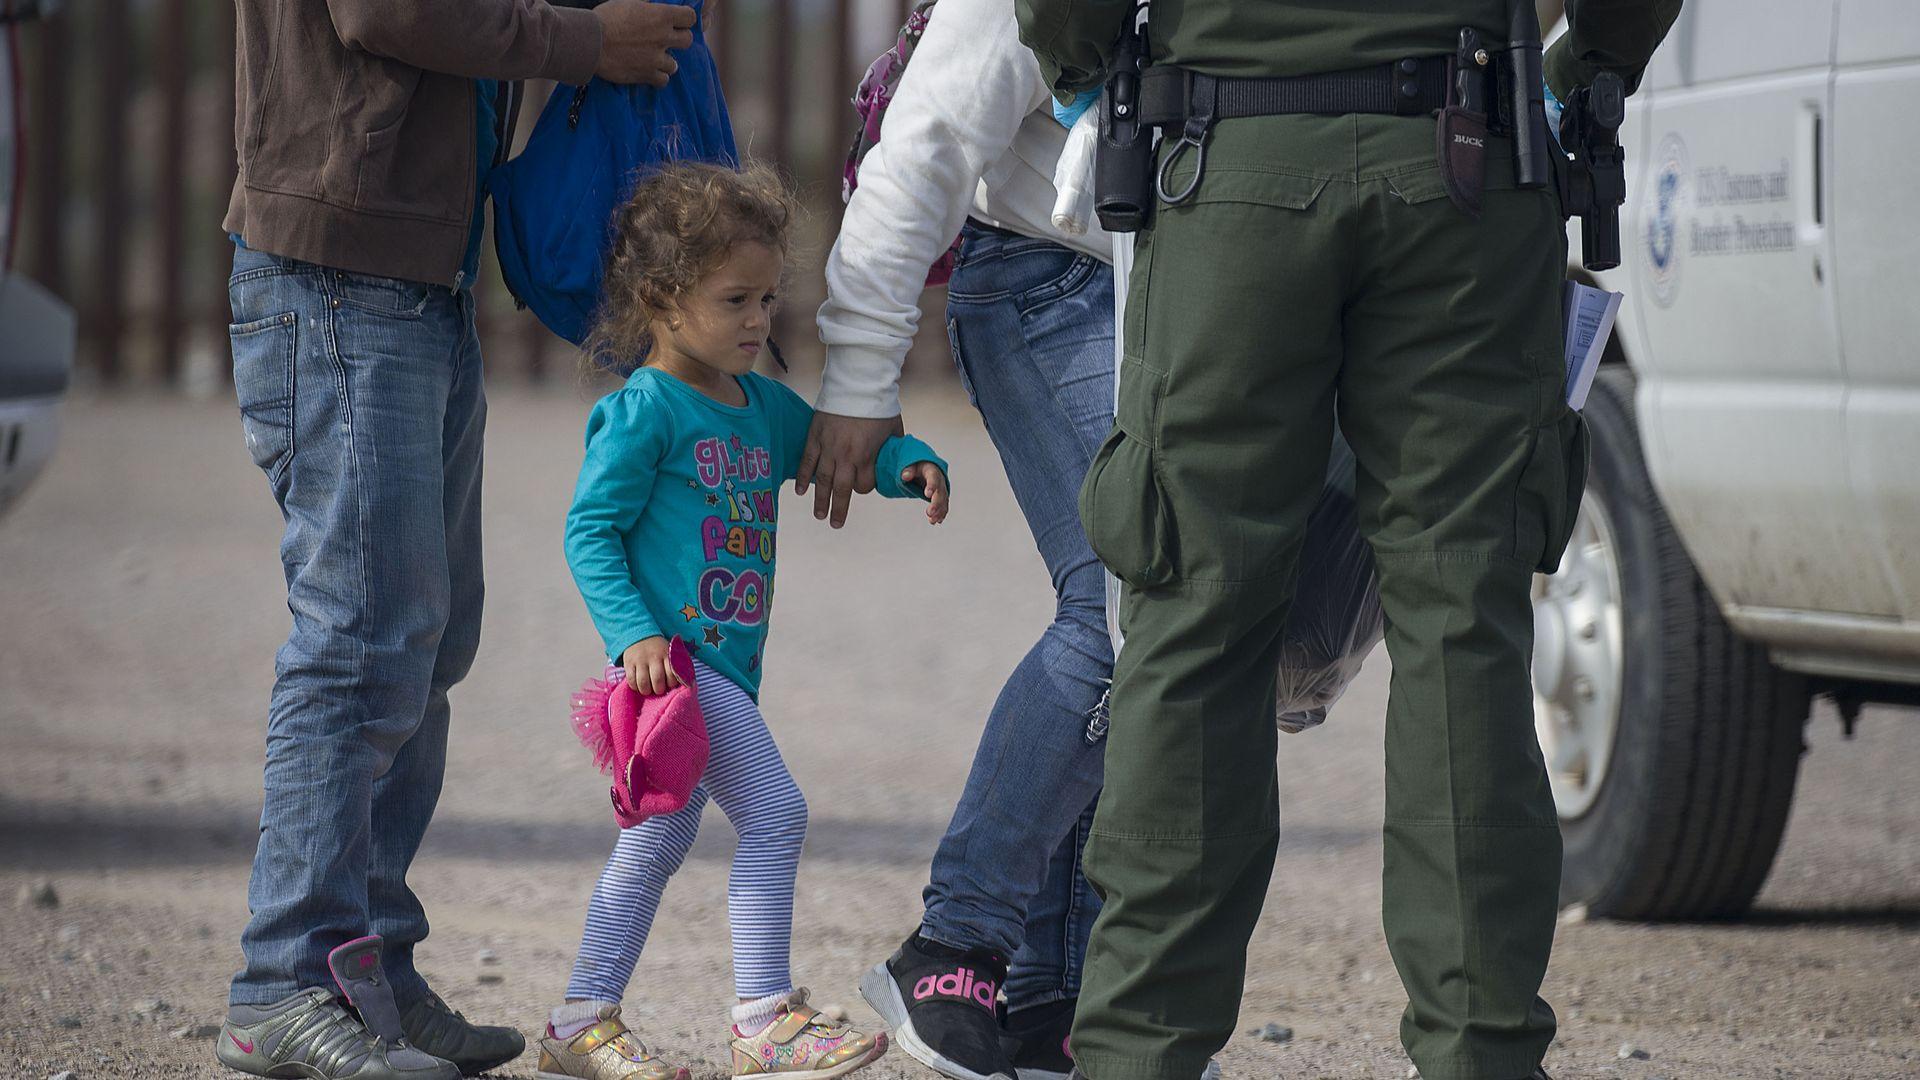 Migrants being processed by Border Patrol